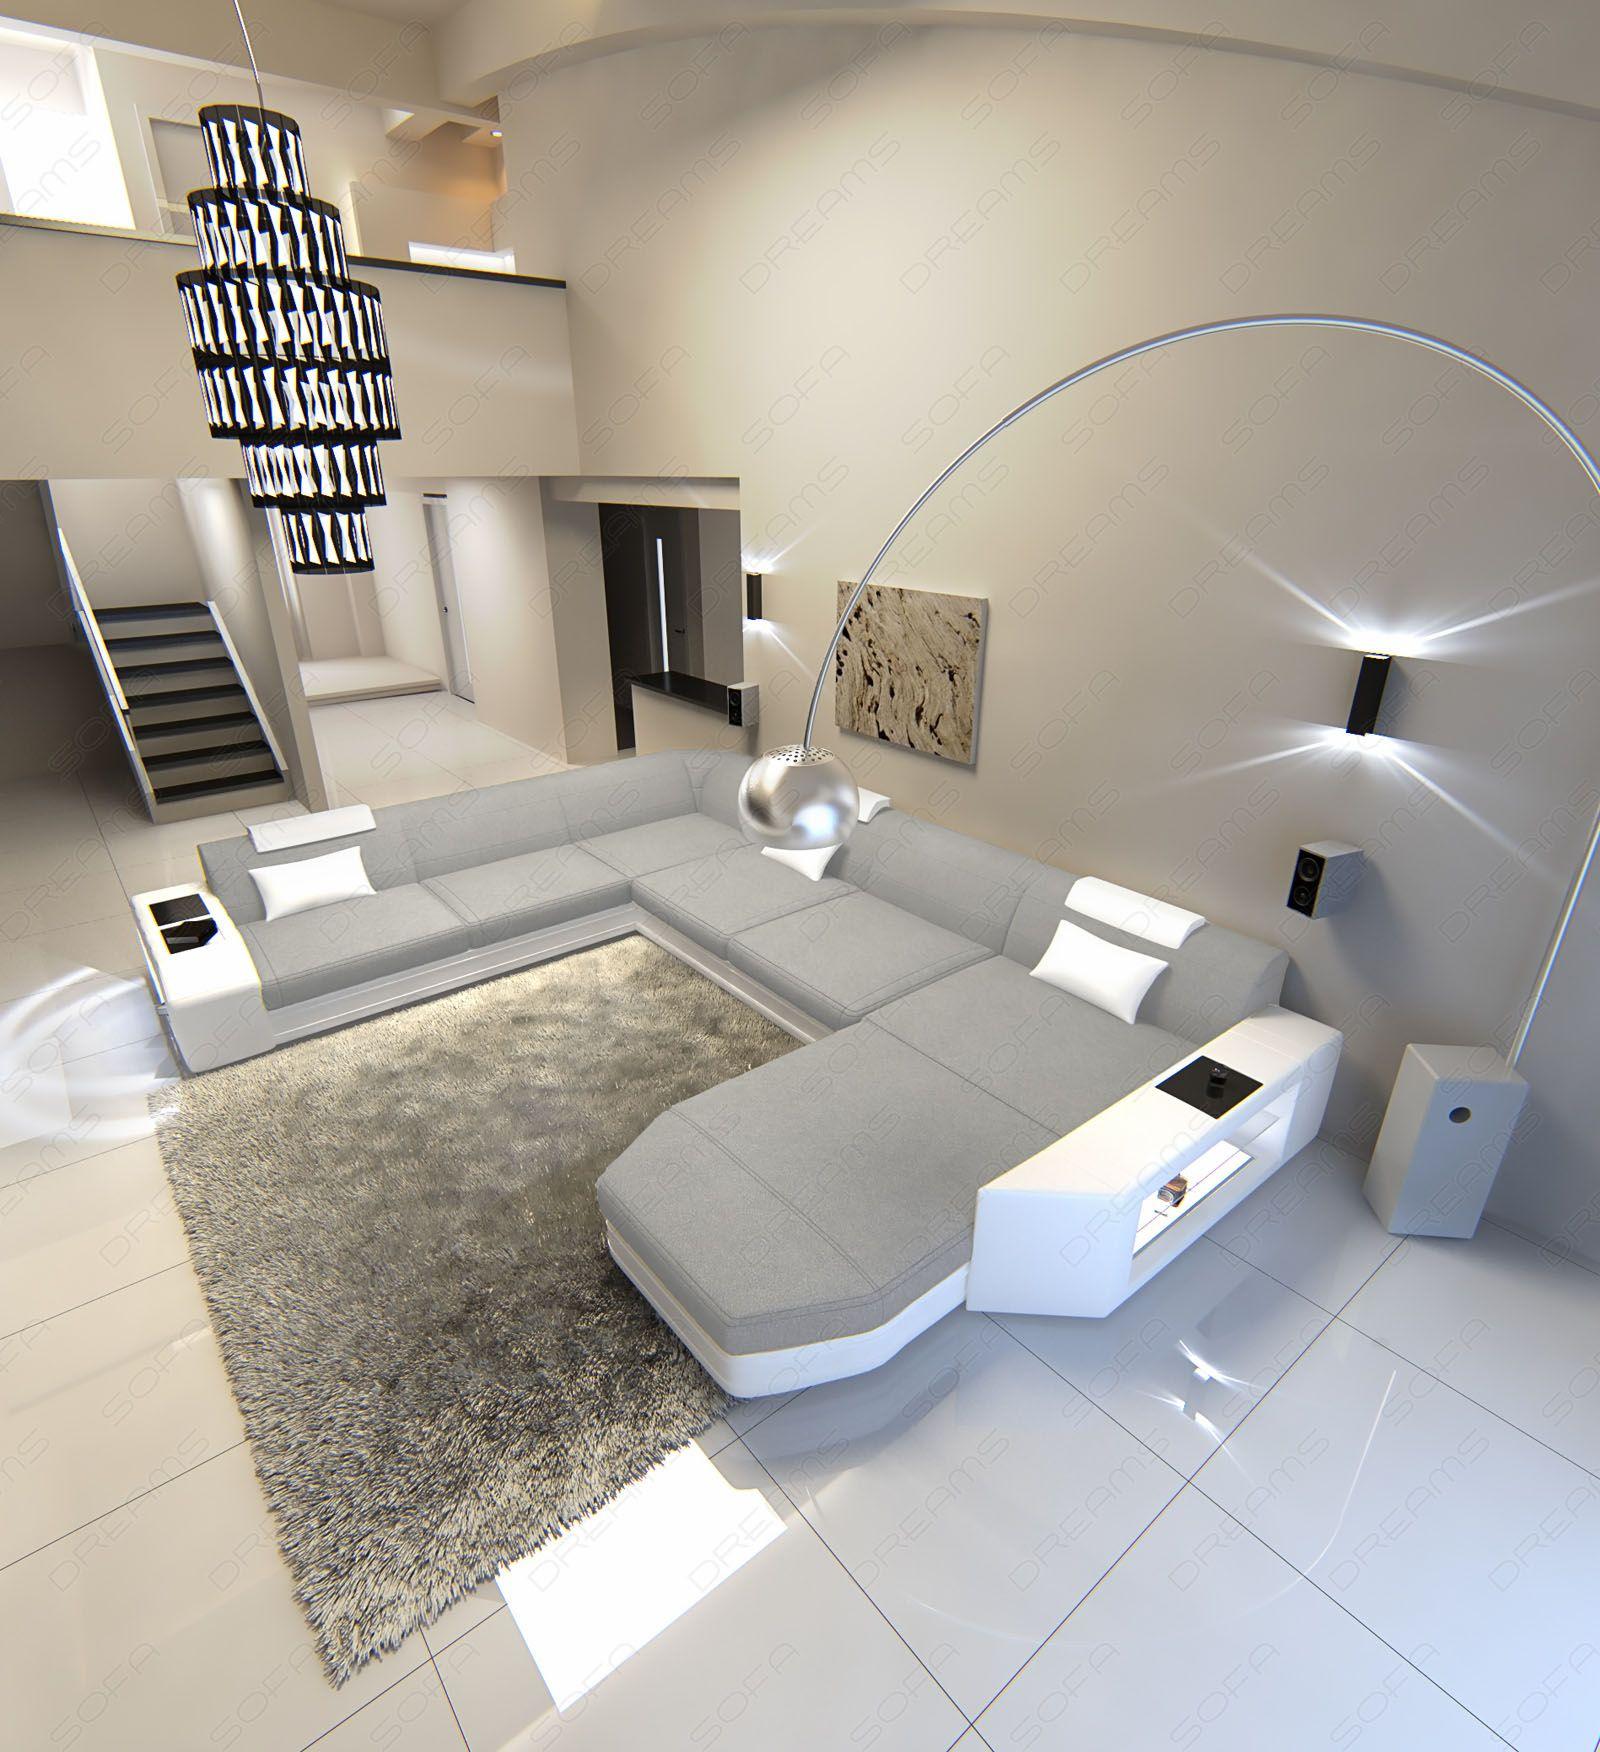 Fabric Sectional Sofa PRATO XXL Design Sofa with LED Lighting RGB ...